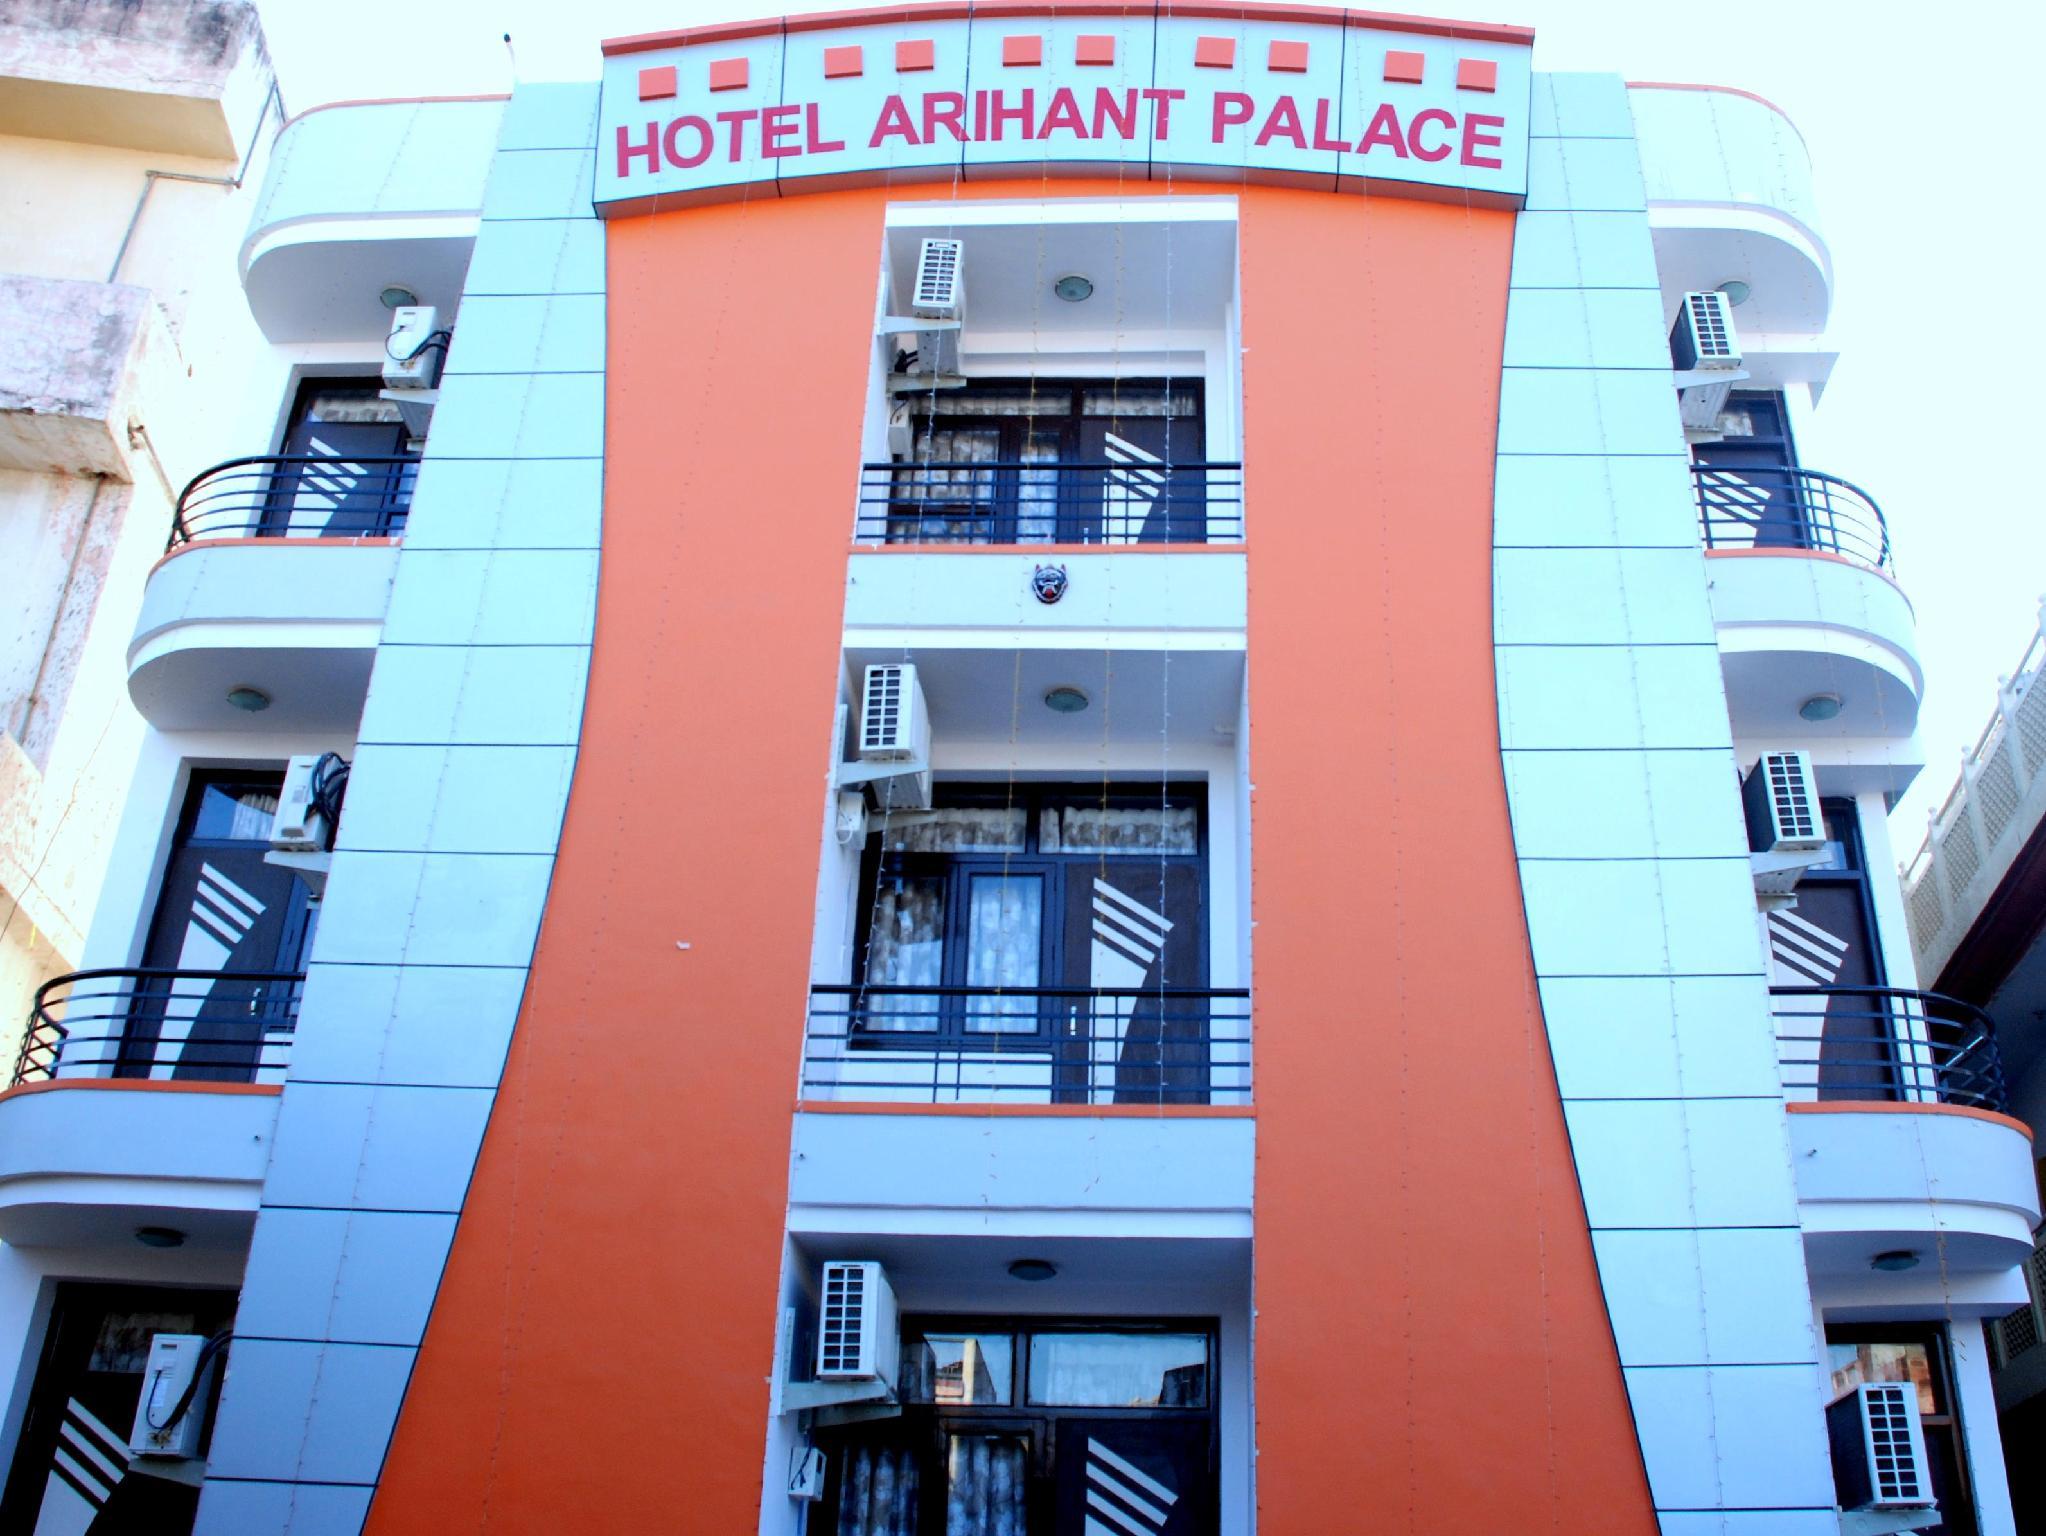 HOTEL ARIHANT PALACE